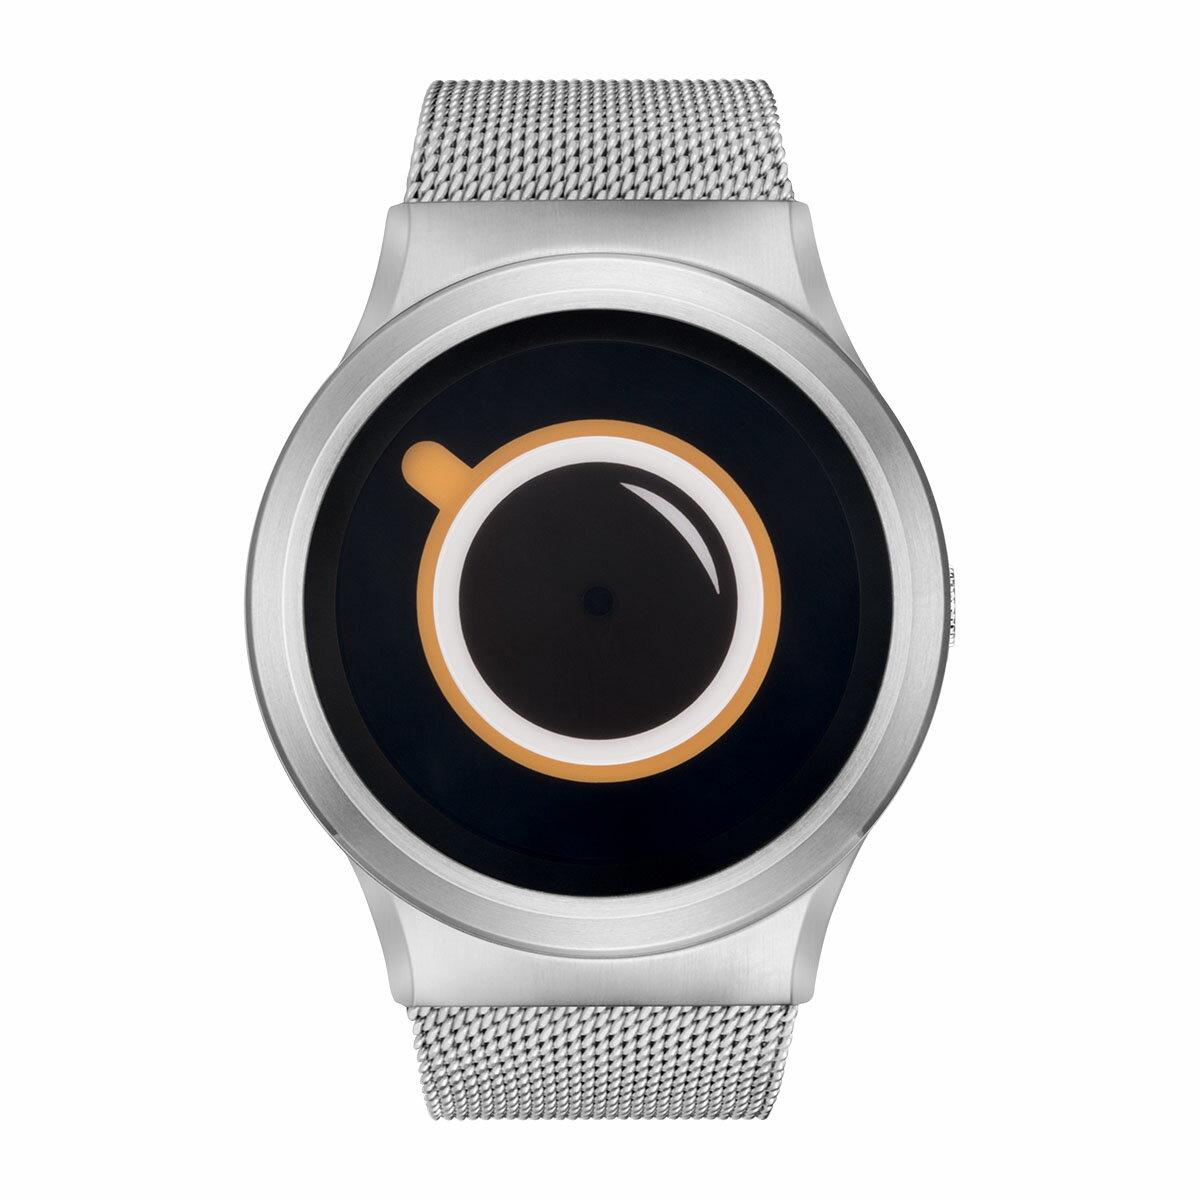 ZEROO COFFEE TIME ゼロ 電池式クォーツ 腕時計 [W03009B01SM01] ベージュ デザインウォッチ ペア用 メンズ レディース ユニセックス おしゃれ時計 デザイナーズ